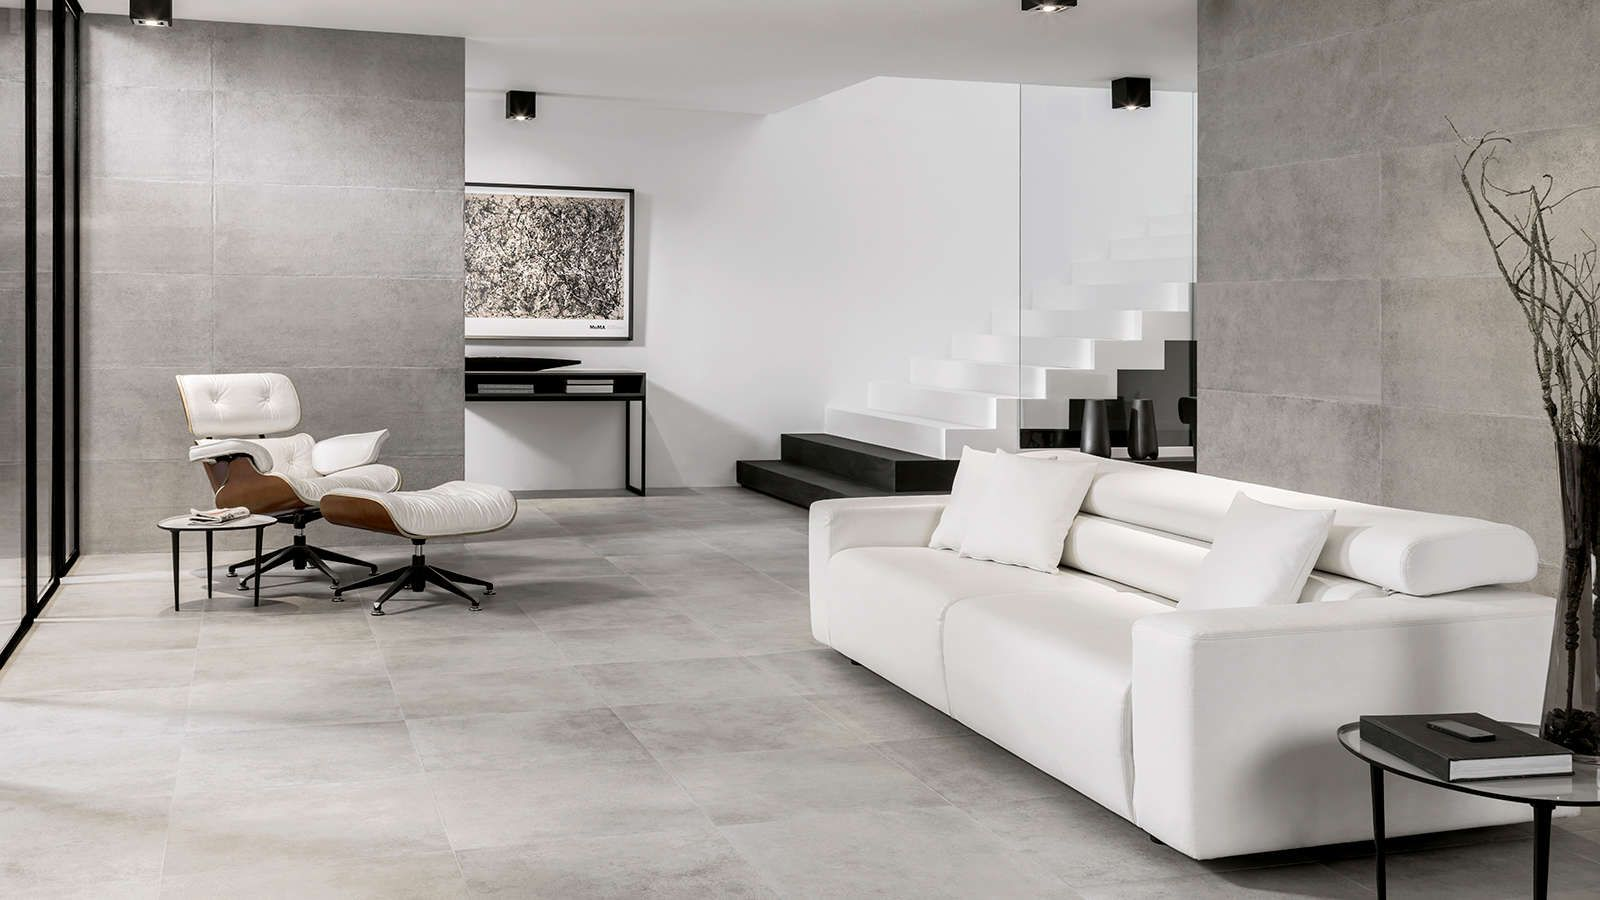 Sol Carrelage Ston Ker Roche Acero 59 6x120 Cm Carreaux De Mur Roche Acero 33 3x100 Cm Deco Maison Carreaux De Sol Deco #stone #wall #tiles #living #room